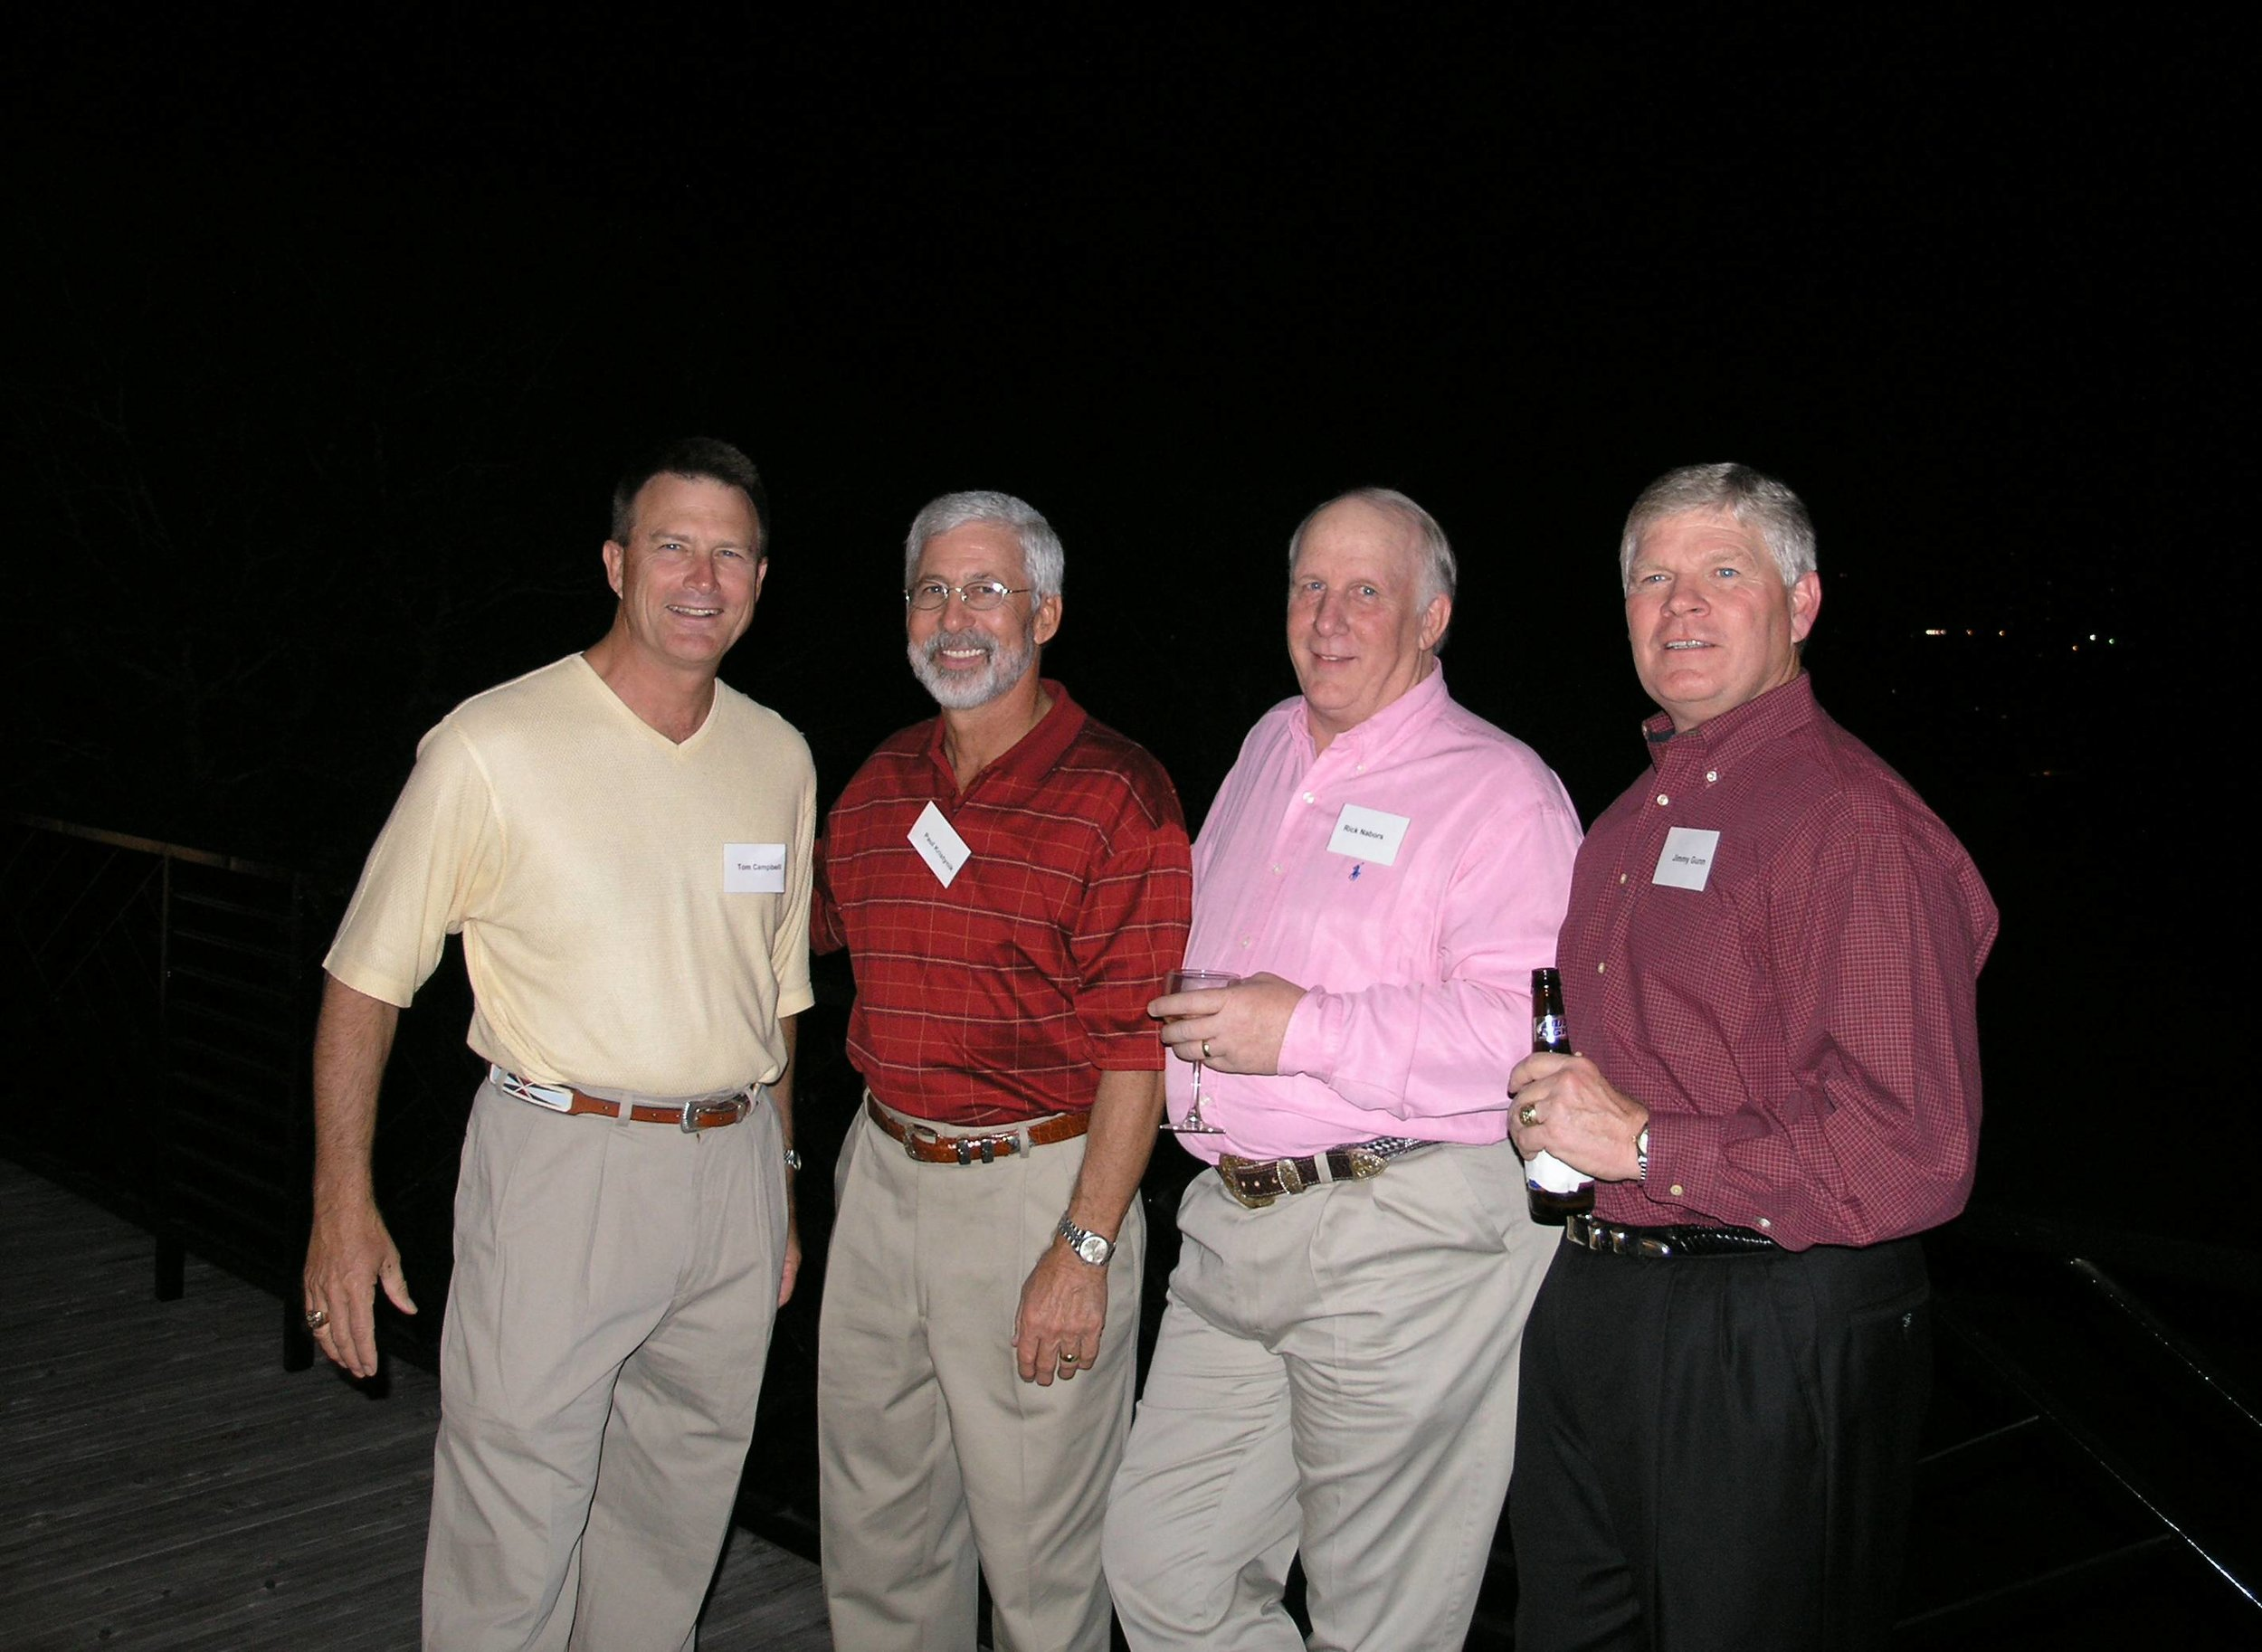 Campbell, Kristynik, Nabors, Gunn